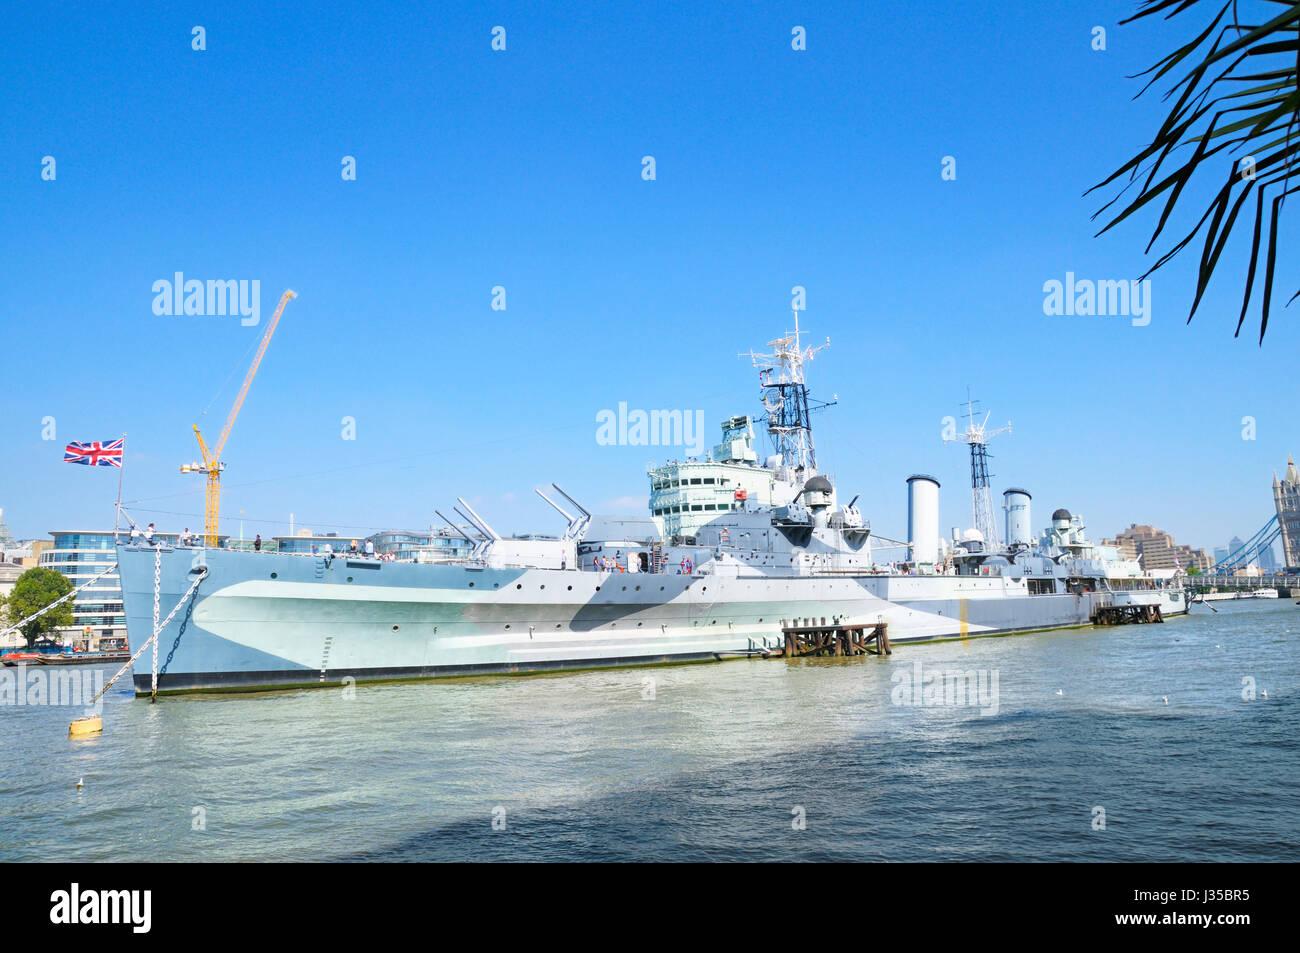 HMS Belfast moored on the River Thames, London, England, UK - Stock Image